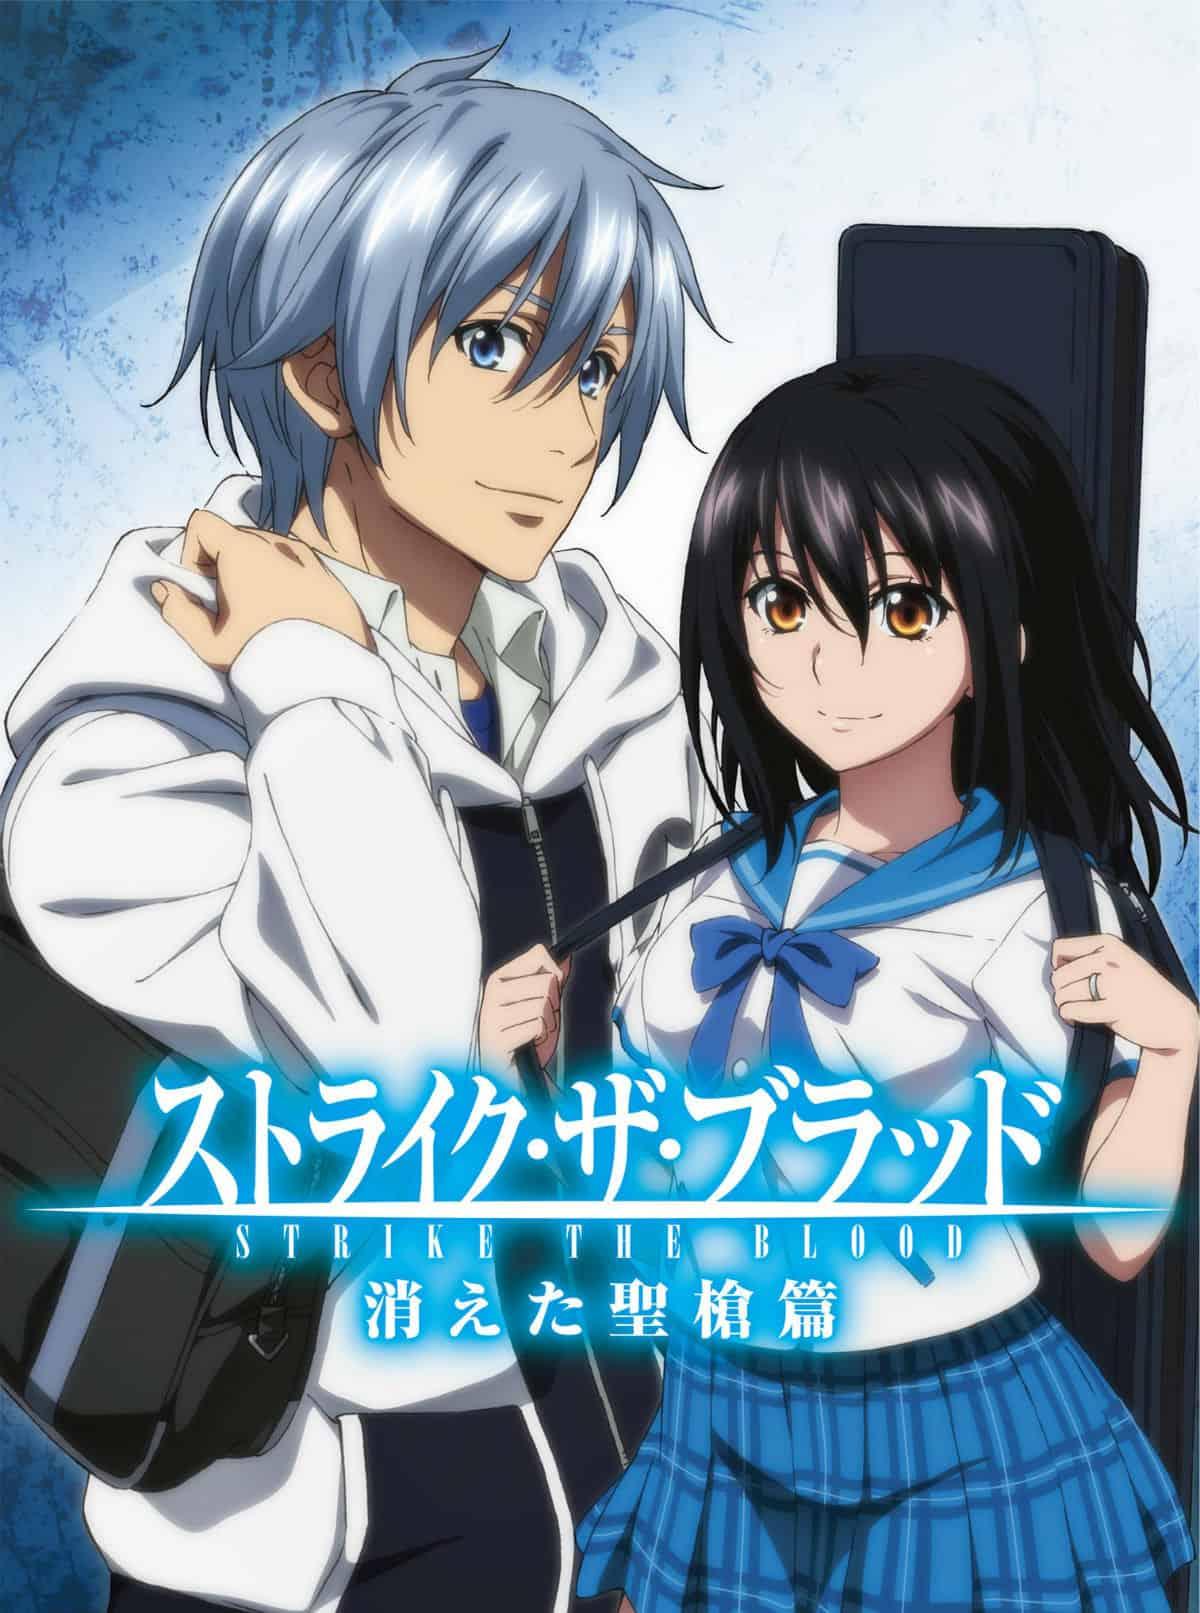 Strike The Blood 4 Fourth Season 4 Anime Key Visual